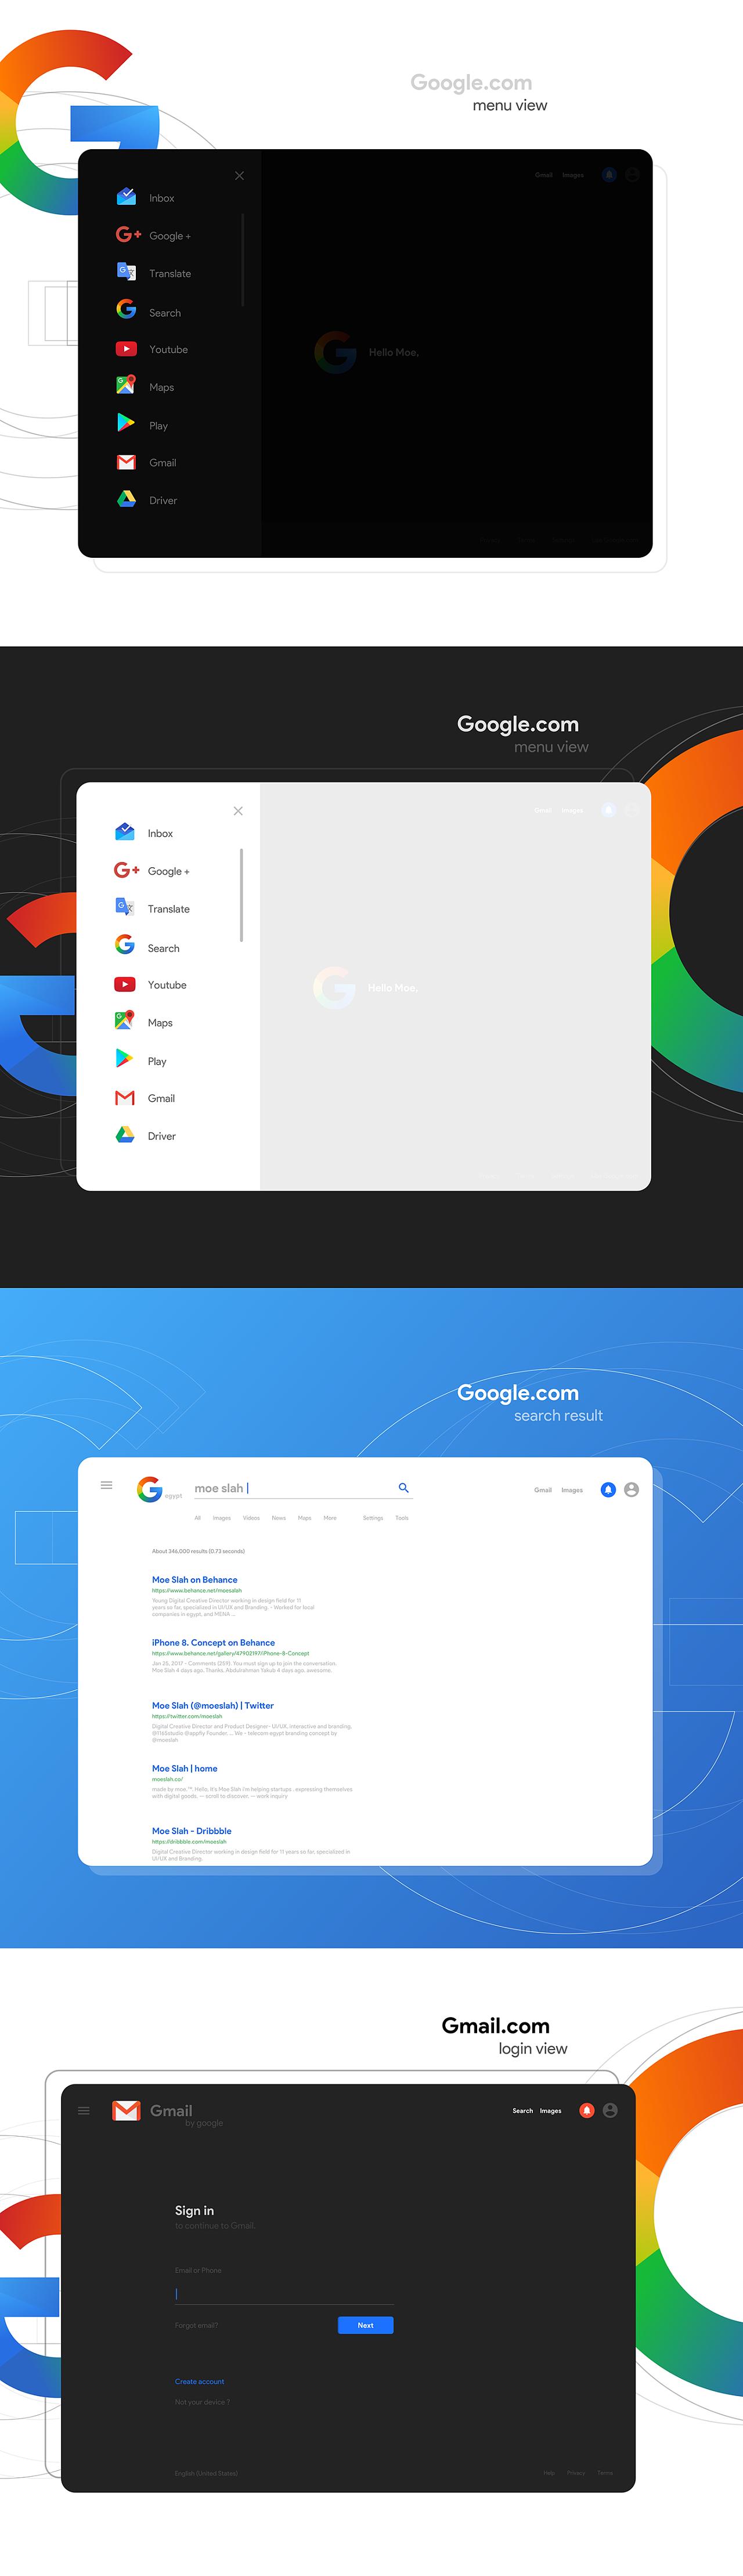 Google new look UI设计 欣赏-第5张